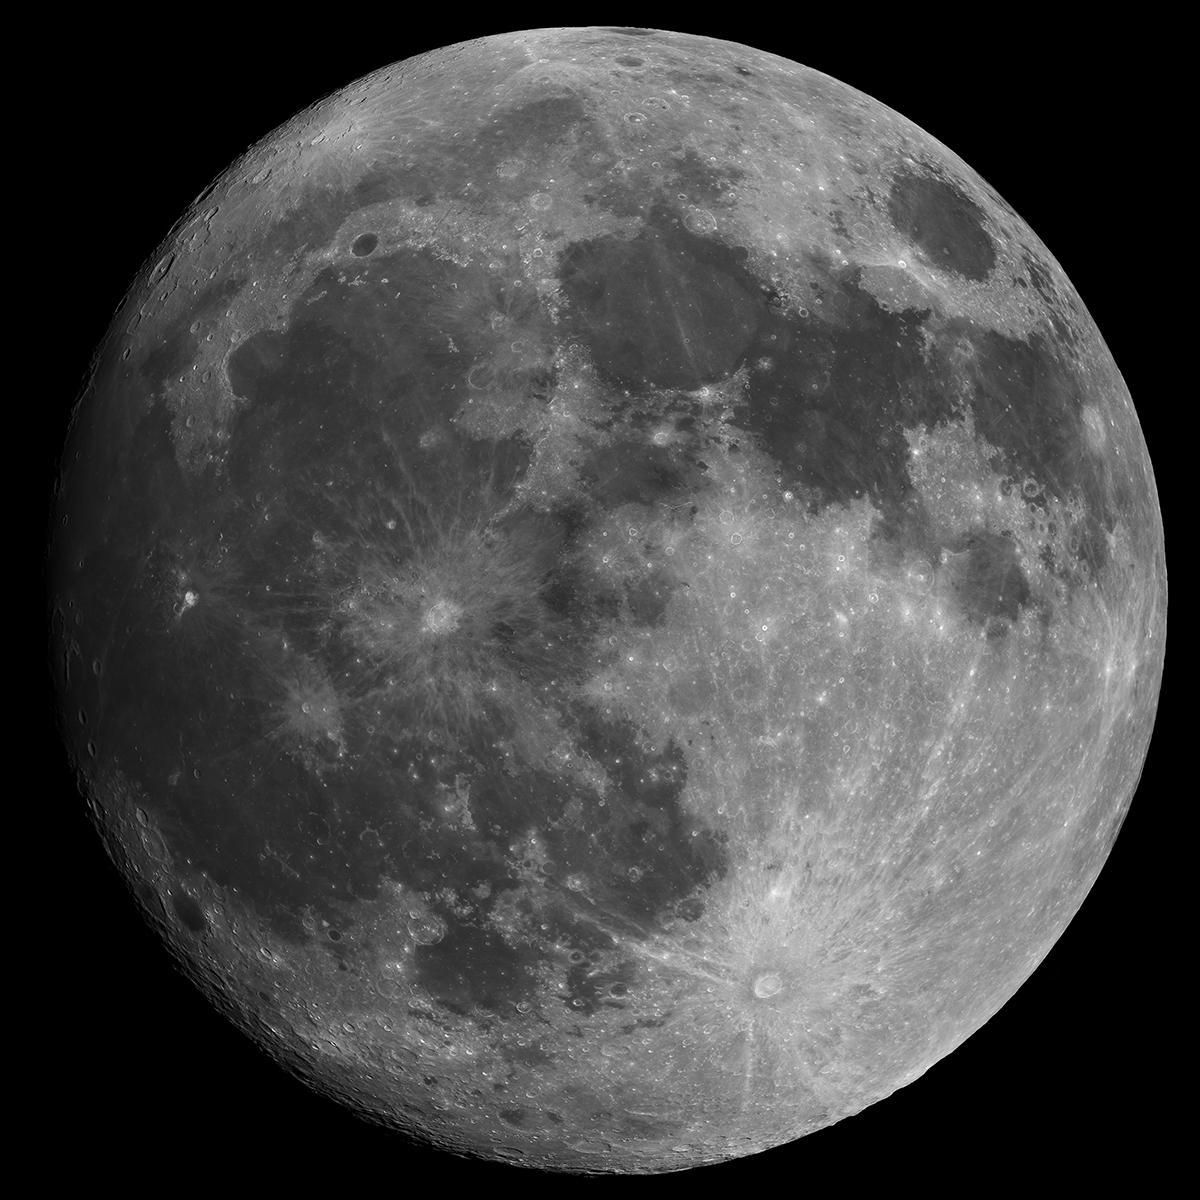 moon_2019-12-10_1200px.jpg